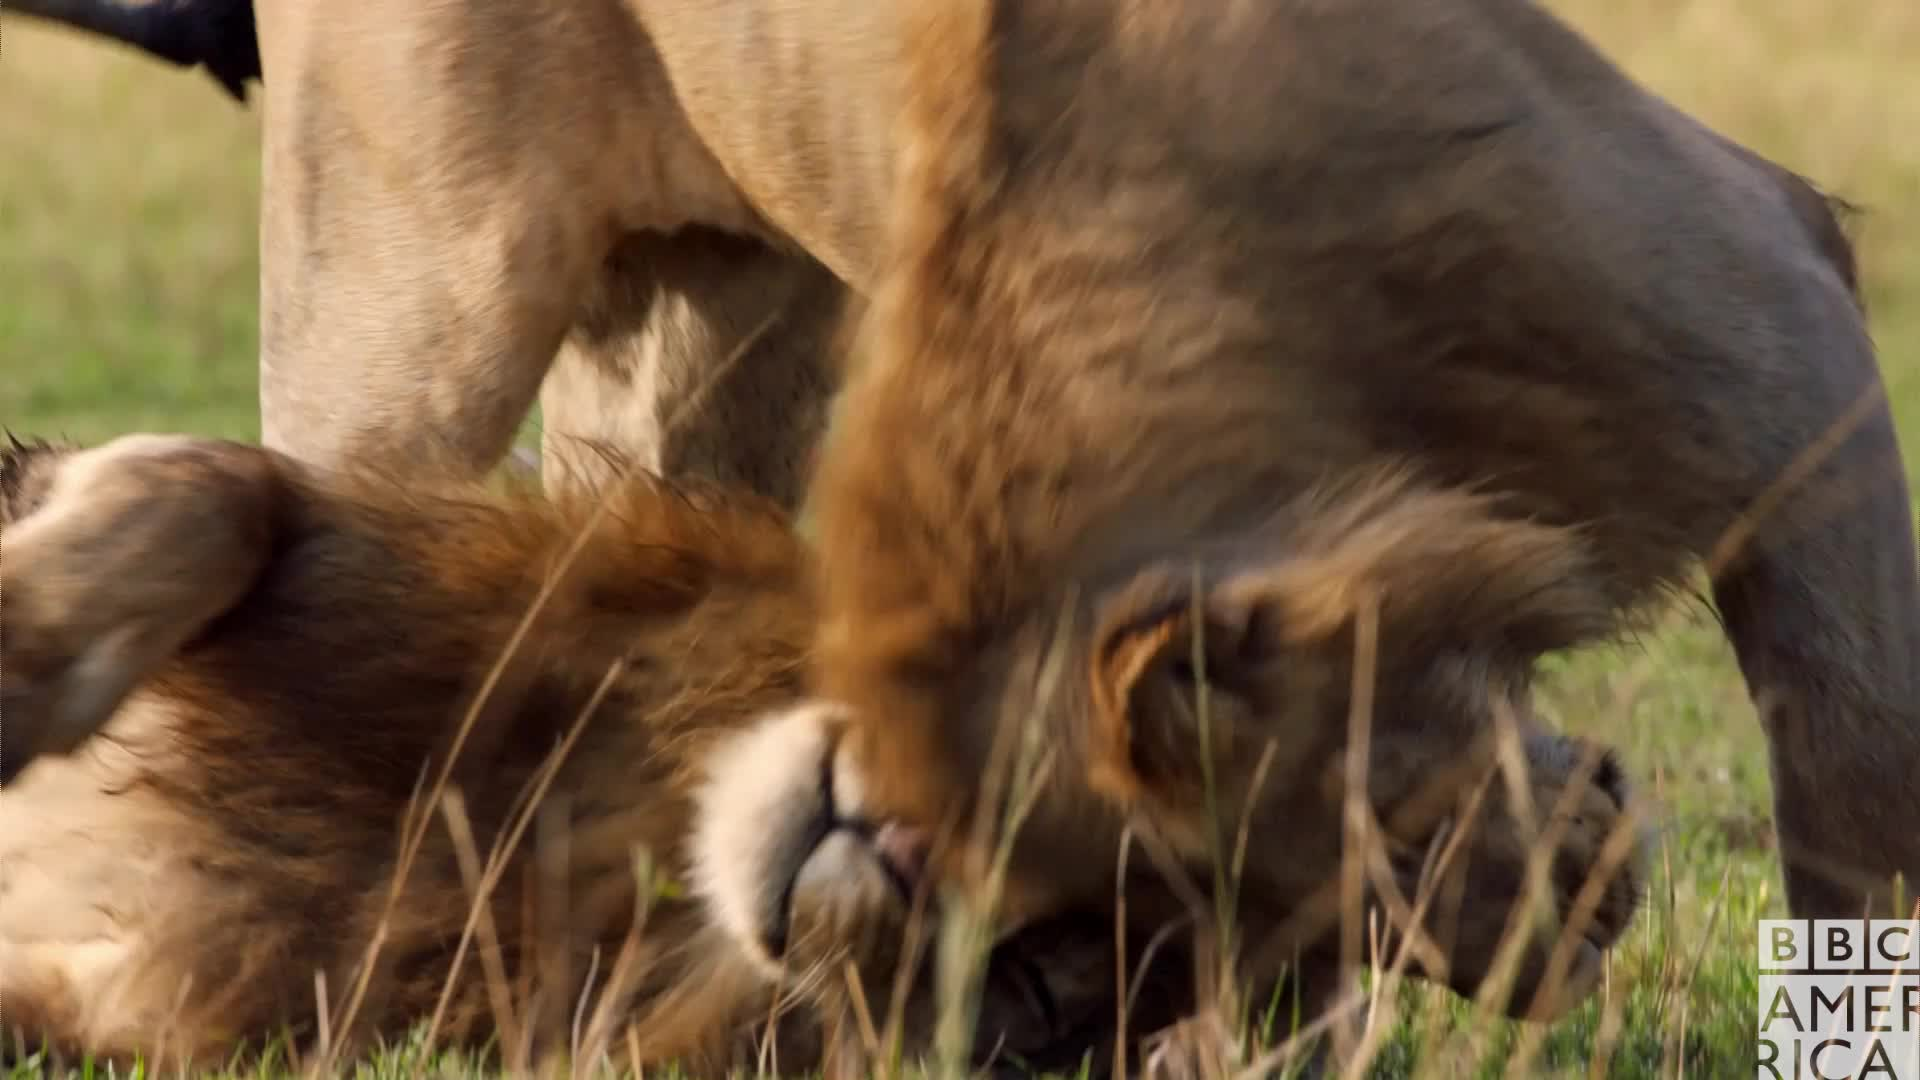 animal, animals, bbc america, bbc america dynasties, bbc america: dynasties, cuddle, dynasties, lion, lions, love, snuggle, tired, Dynasties Lions Tired GIFs